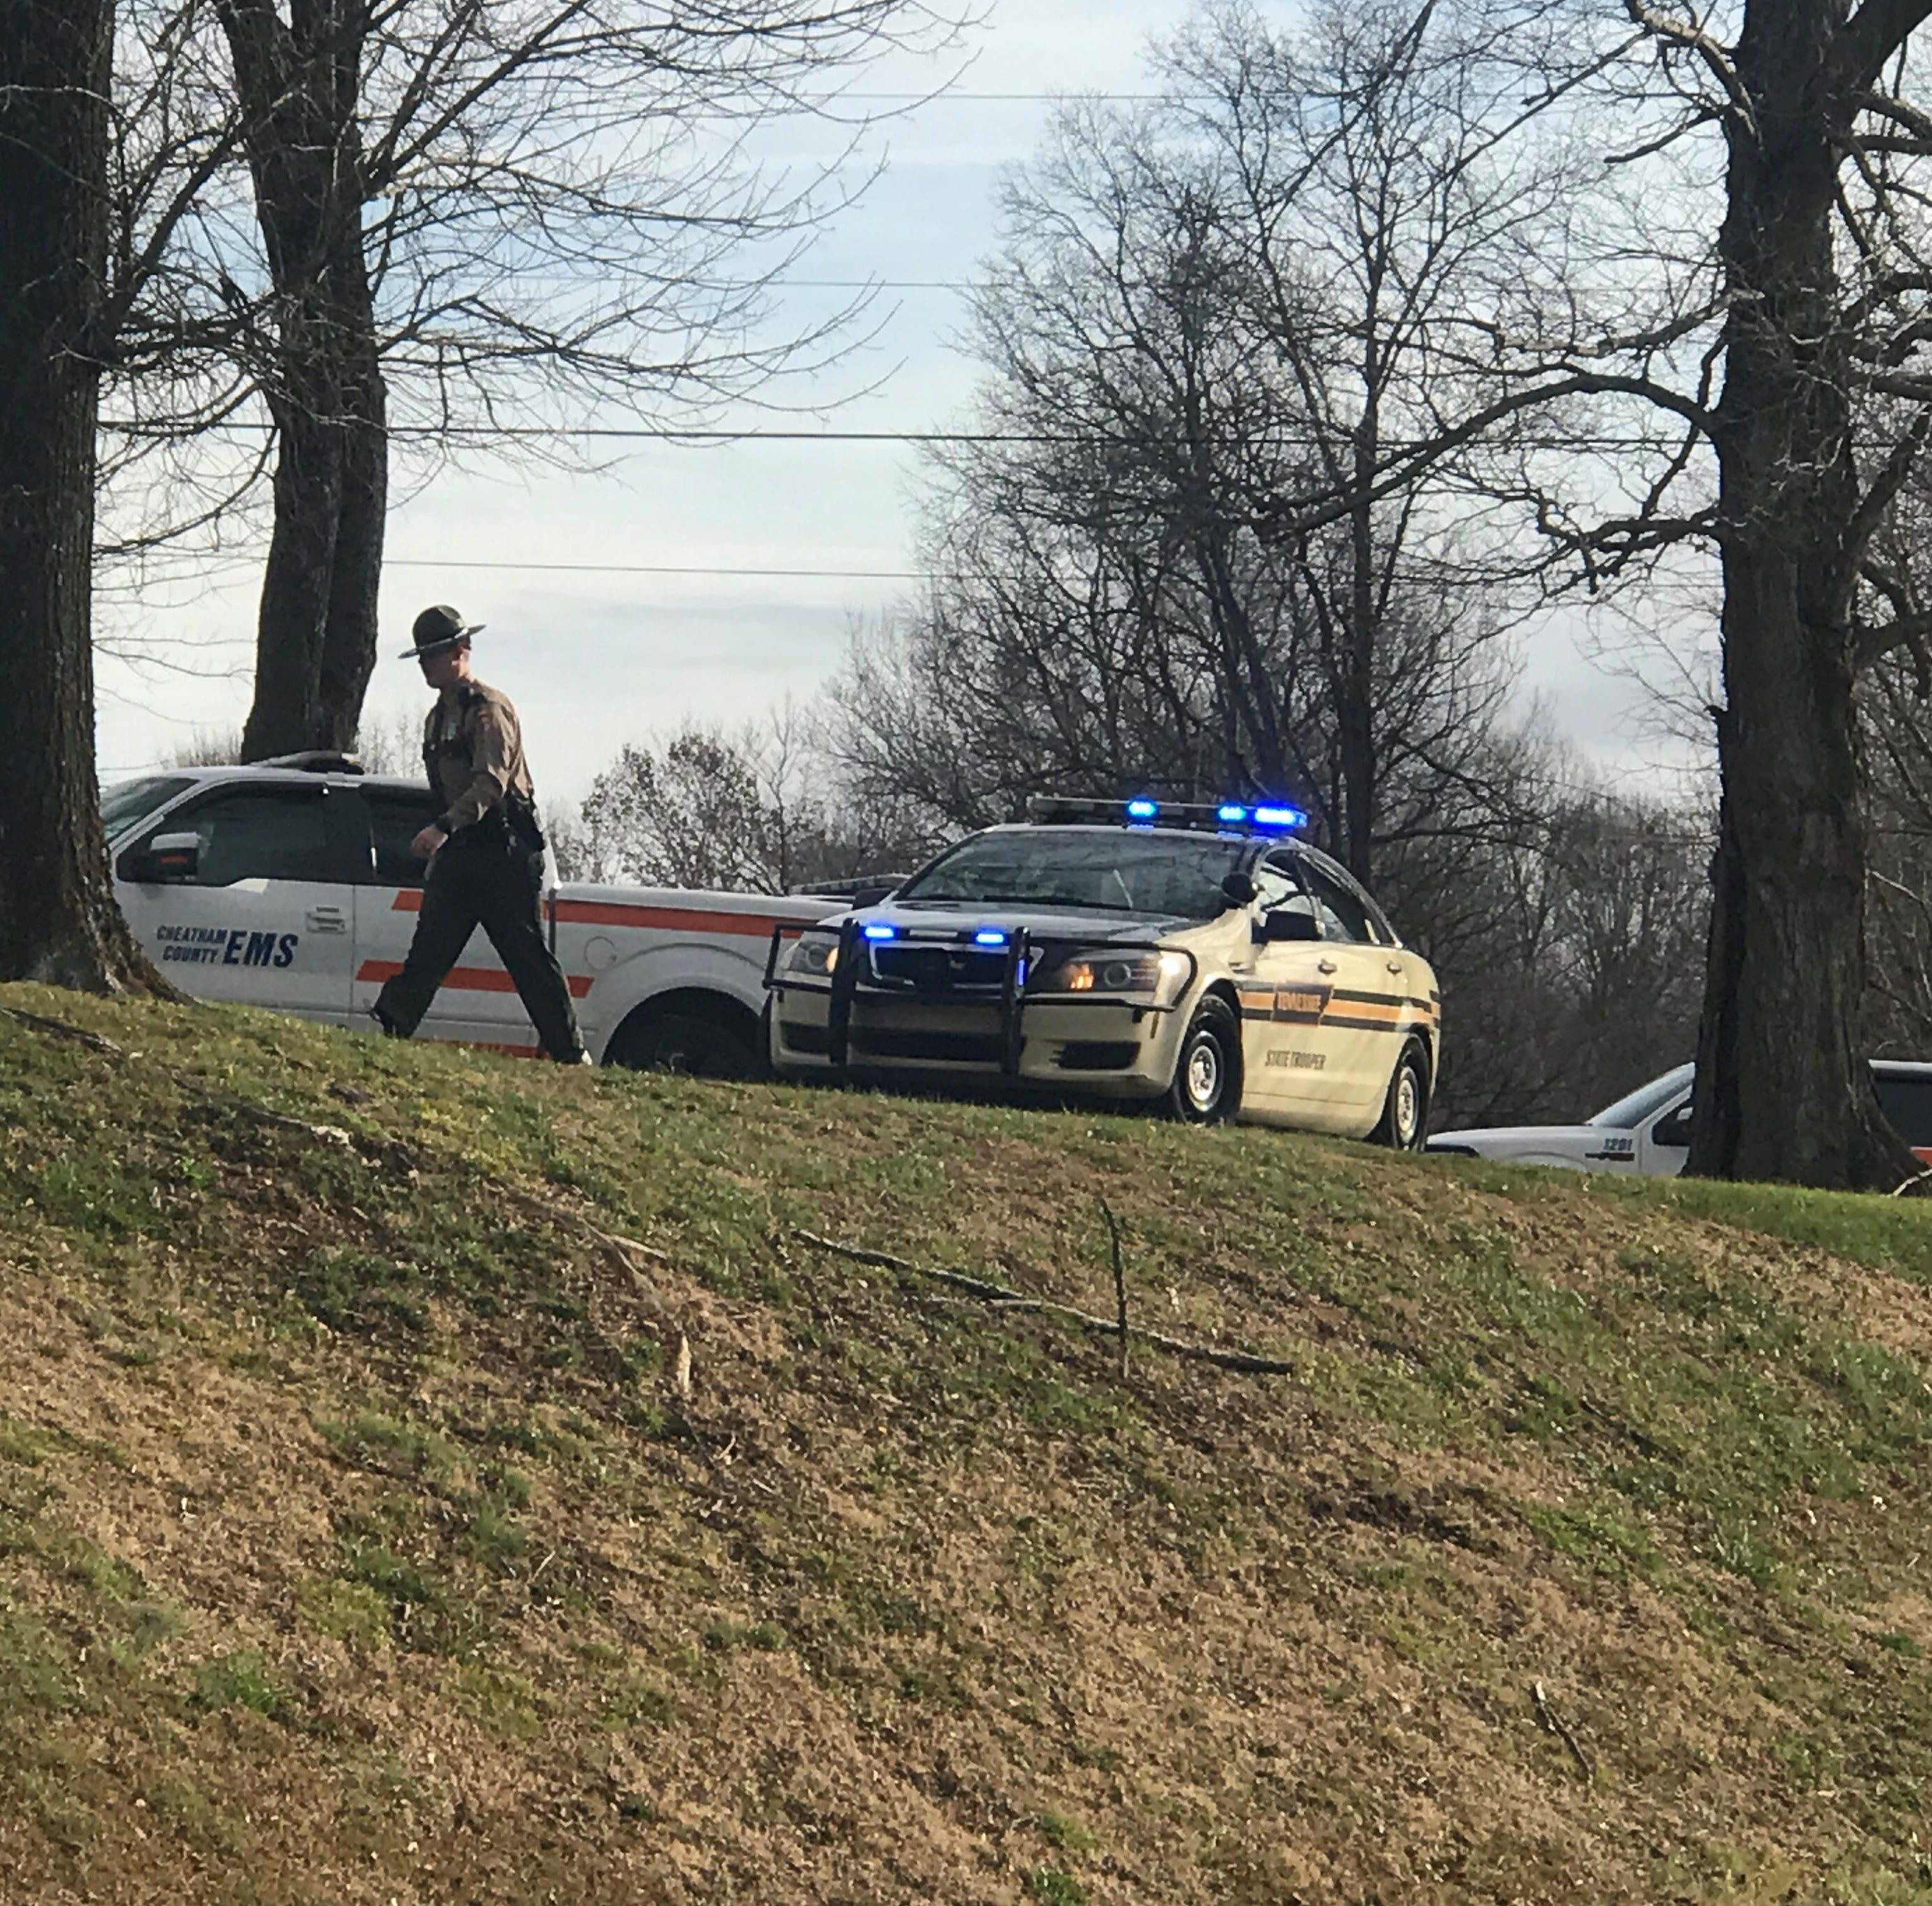 Cheatham Co. Sheriff: 3 dead in single-vehicle crash on Highway 12